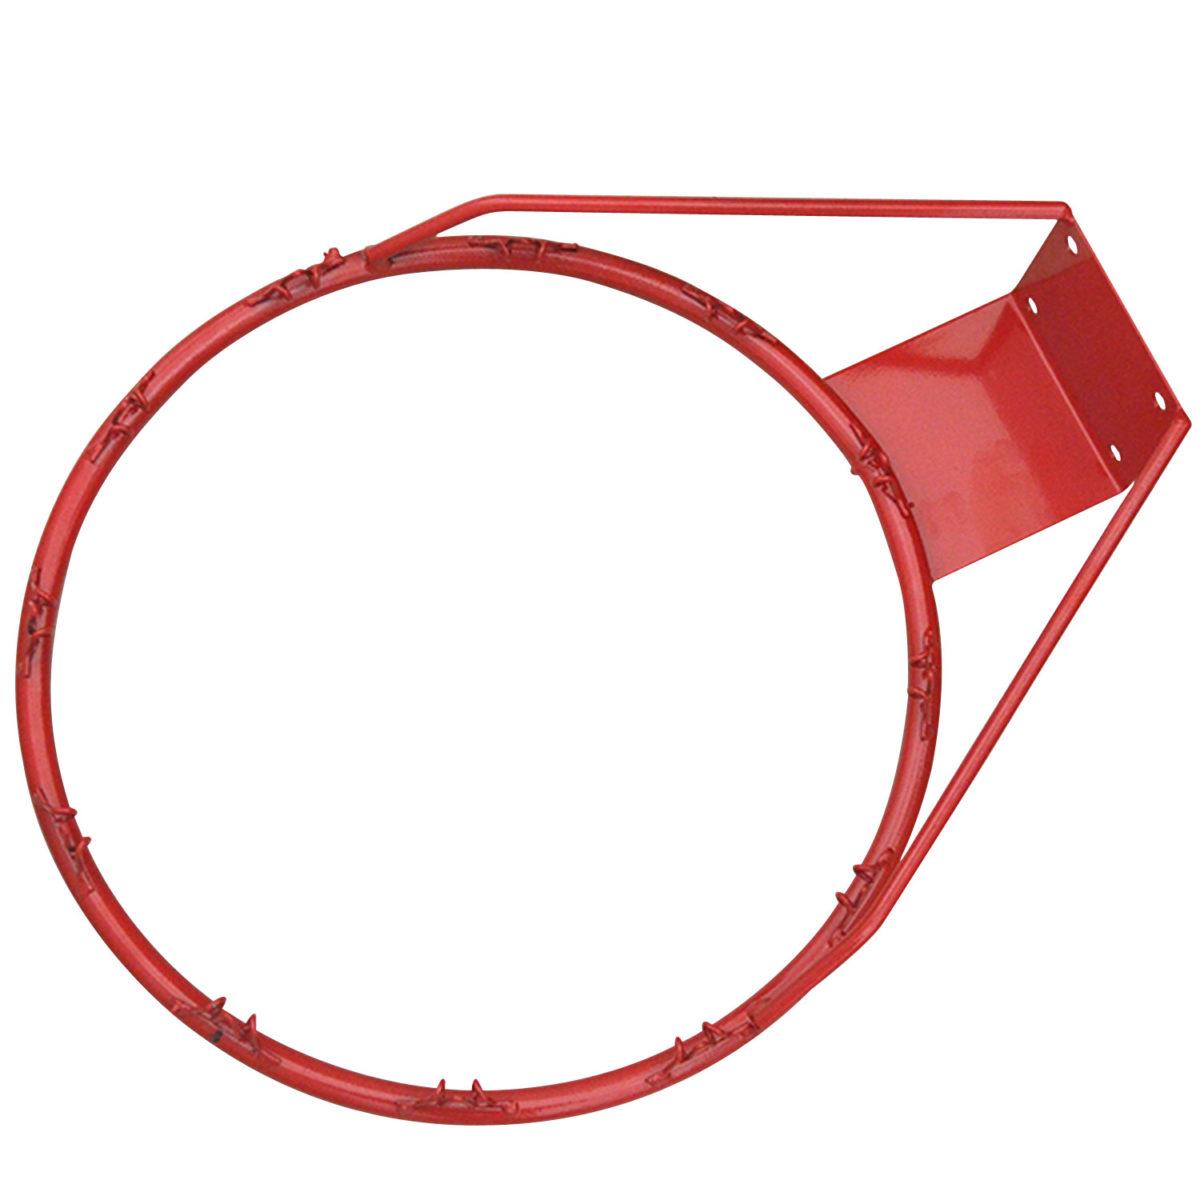 DFC Кольцо баскетбольное 45 см.   R1 - 4